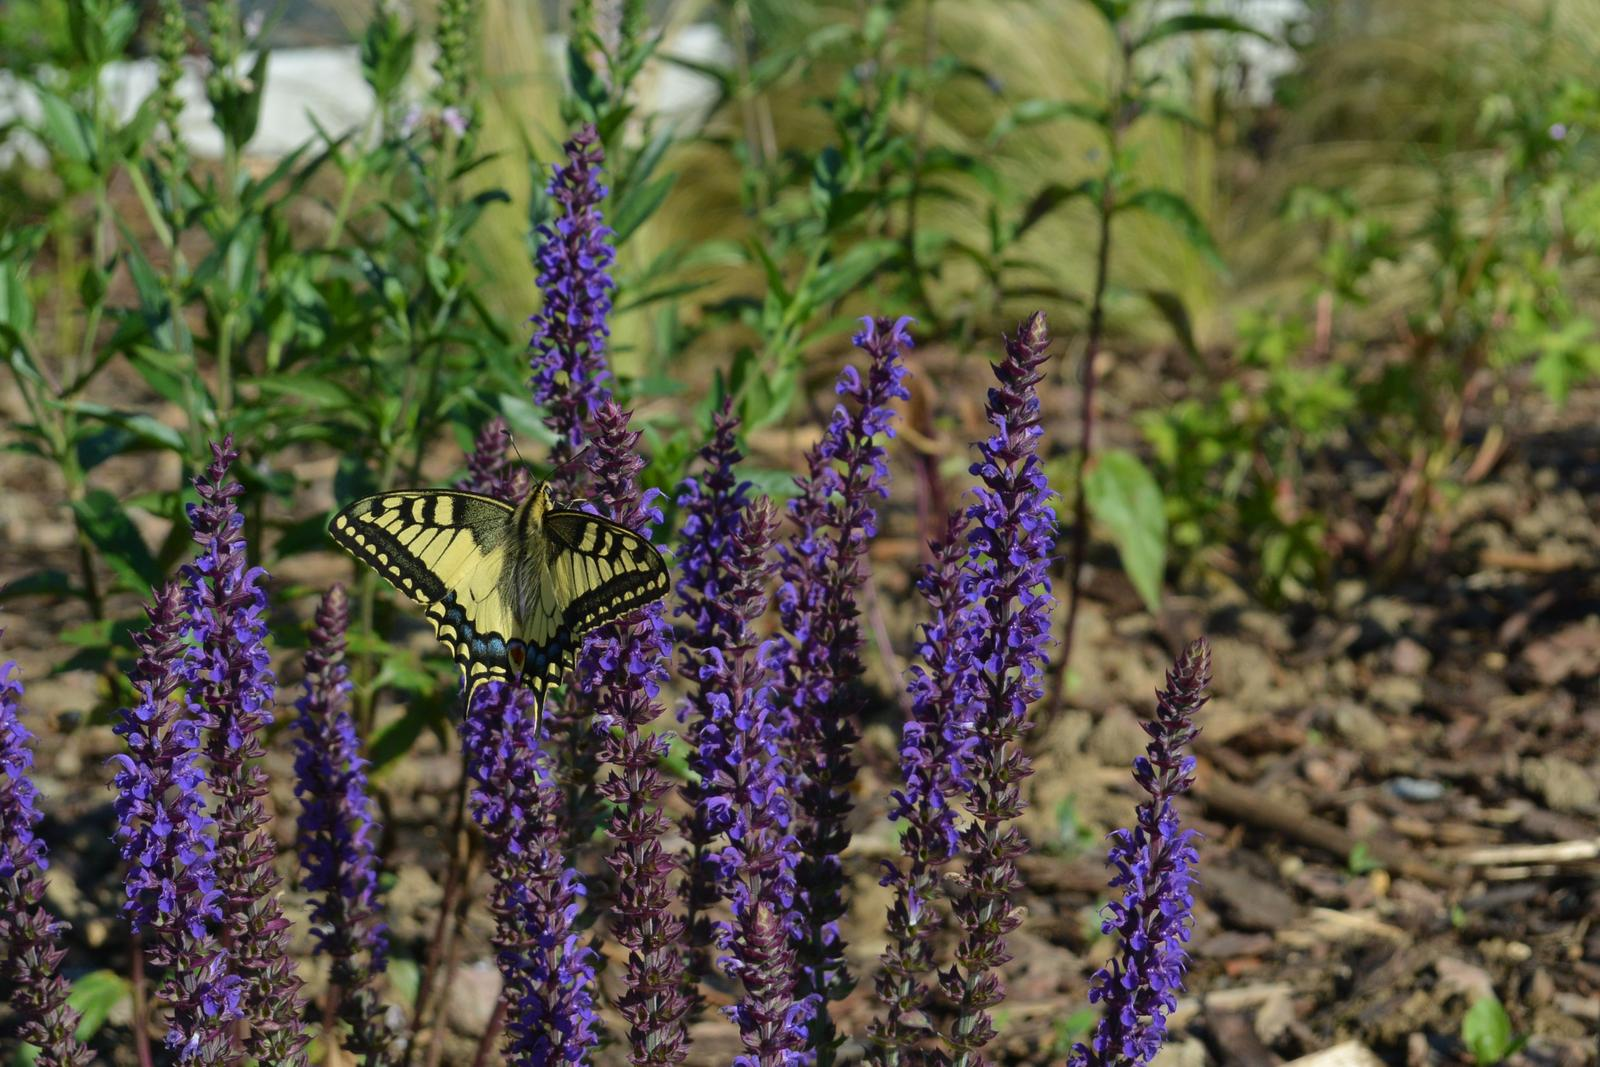 Motýlí zahrada 2019-2020 - Otakárek fenyklový